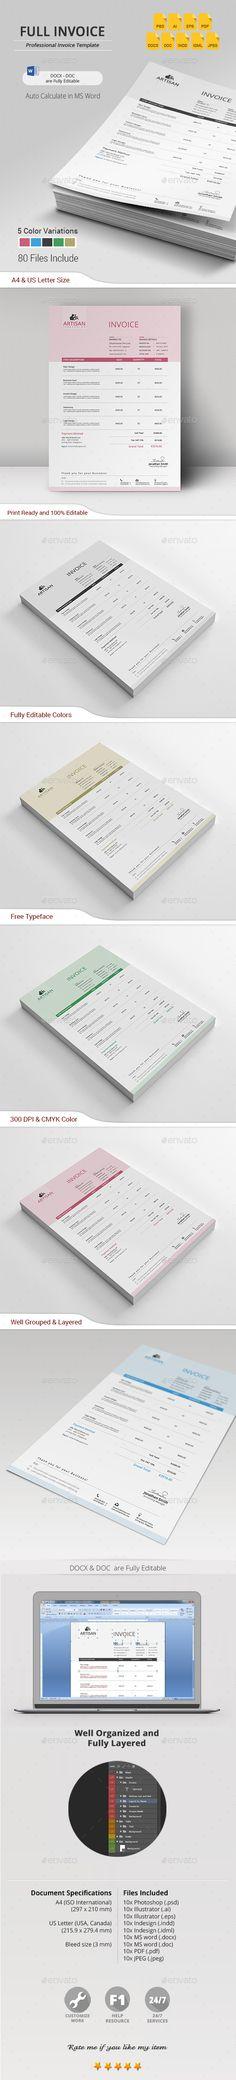 Invoiceto - Invoice Generator #BusinessTools WebmasterTools - invoice generator